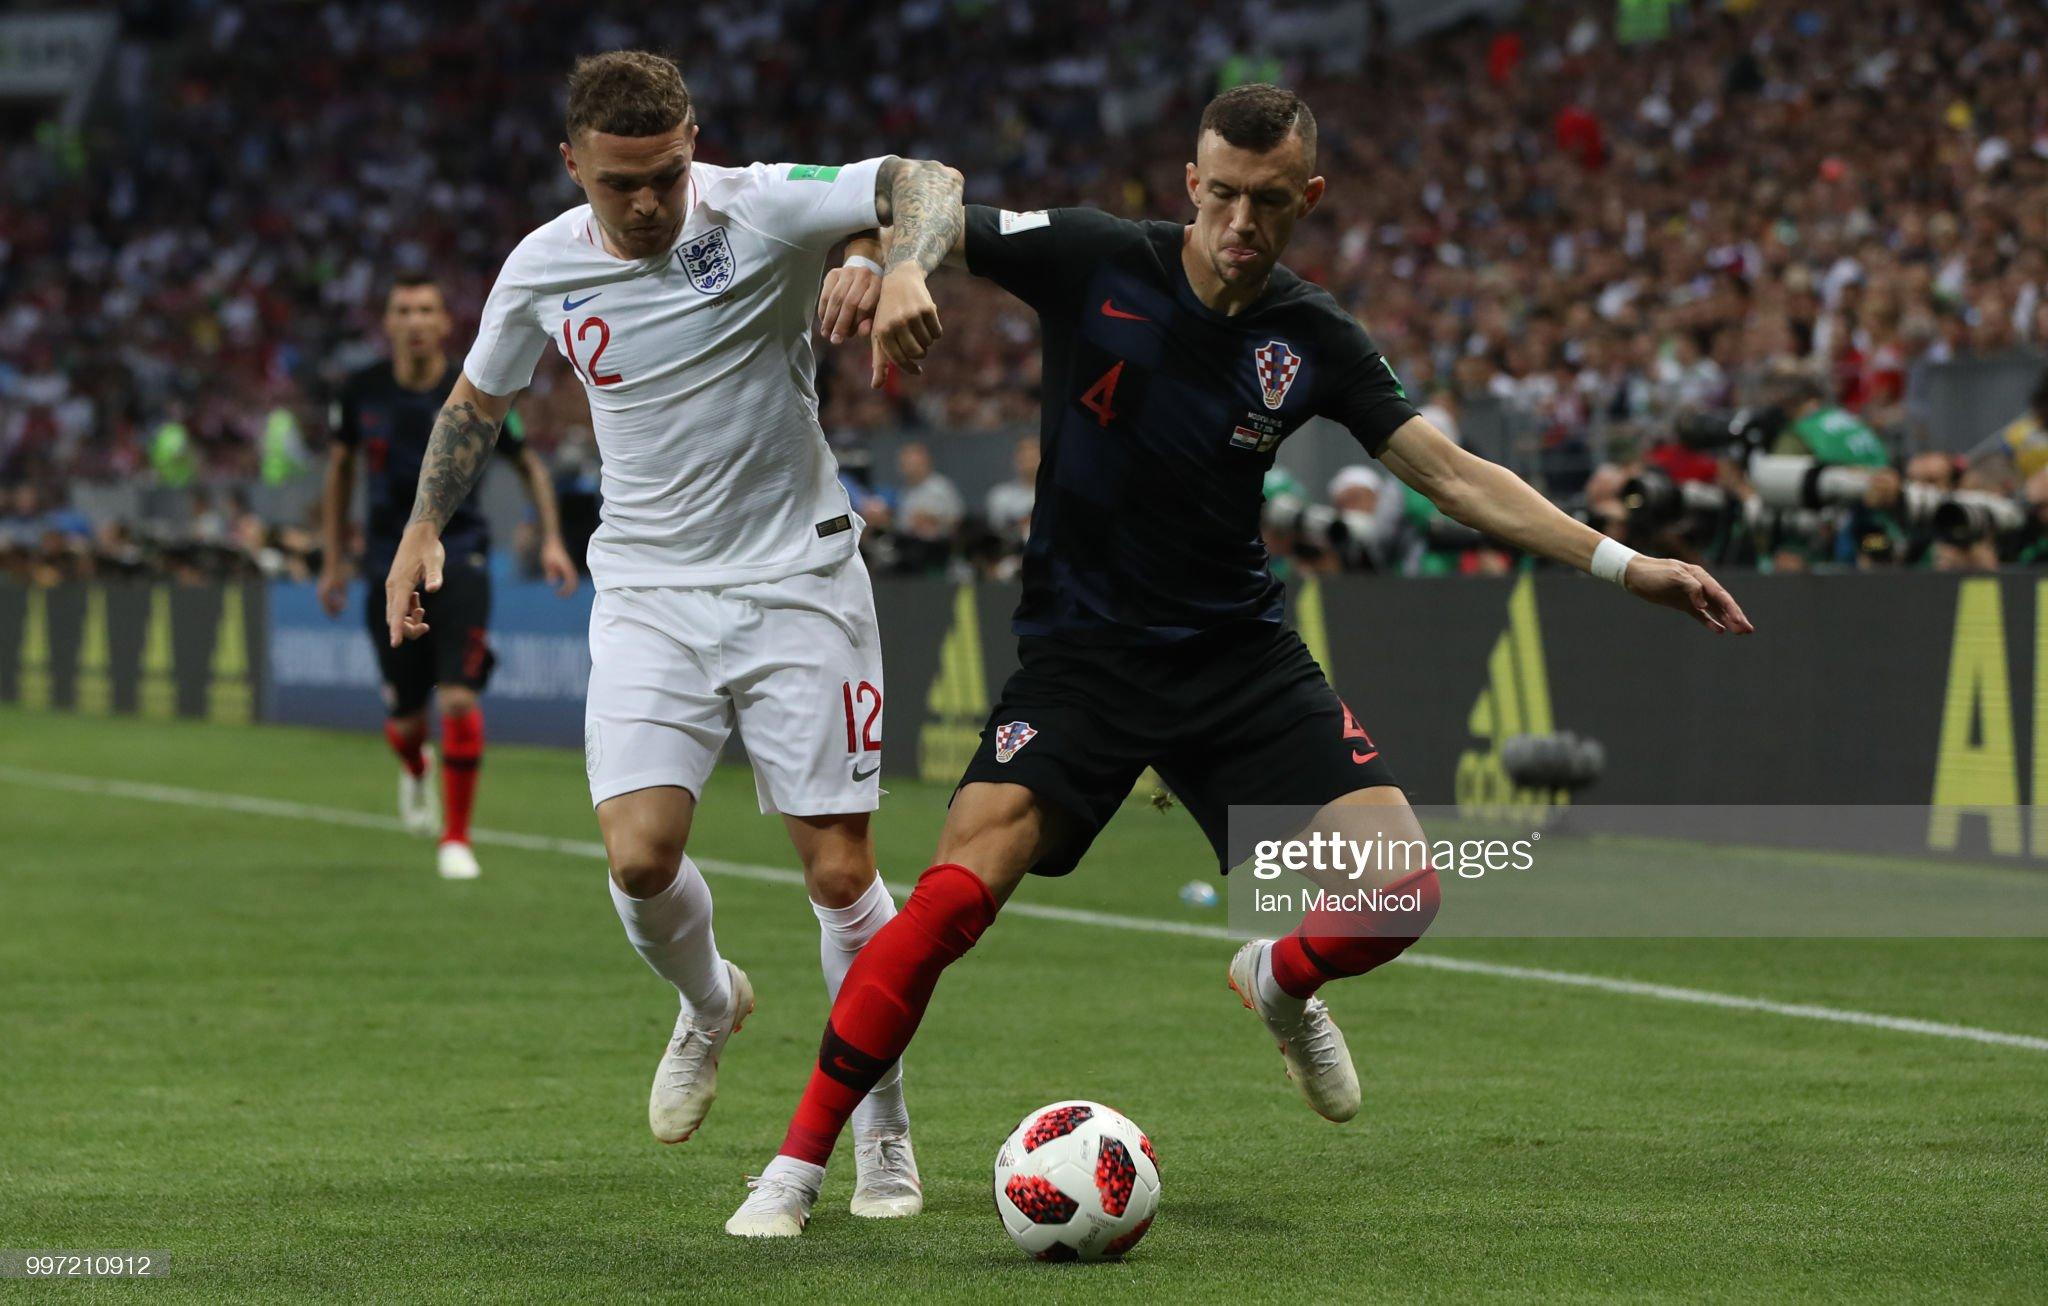 England vs Croatia Preview, prediction and odds